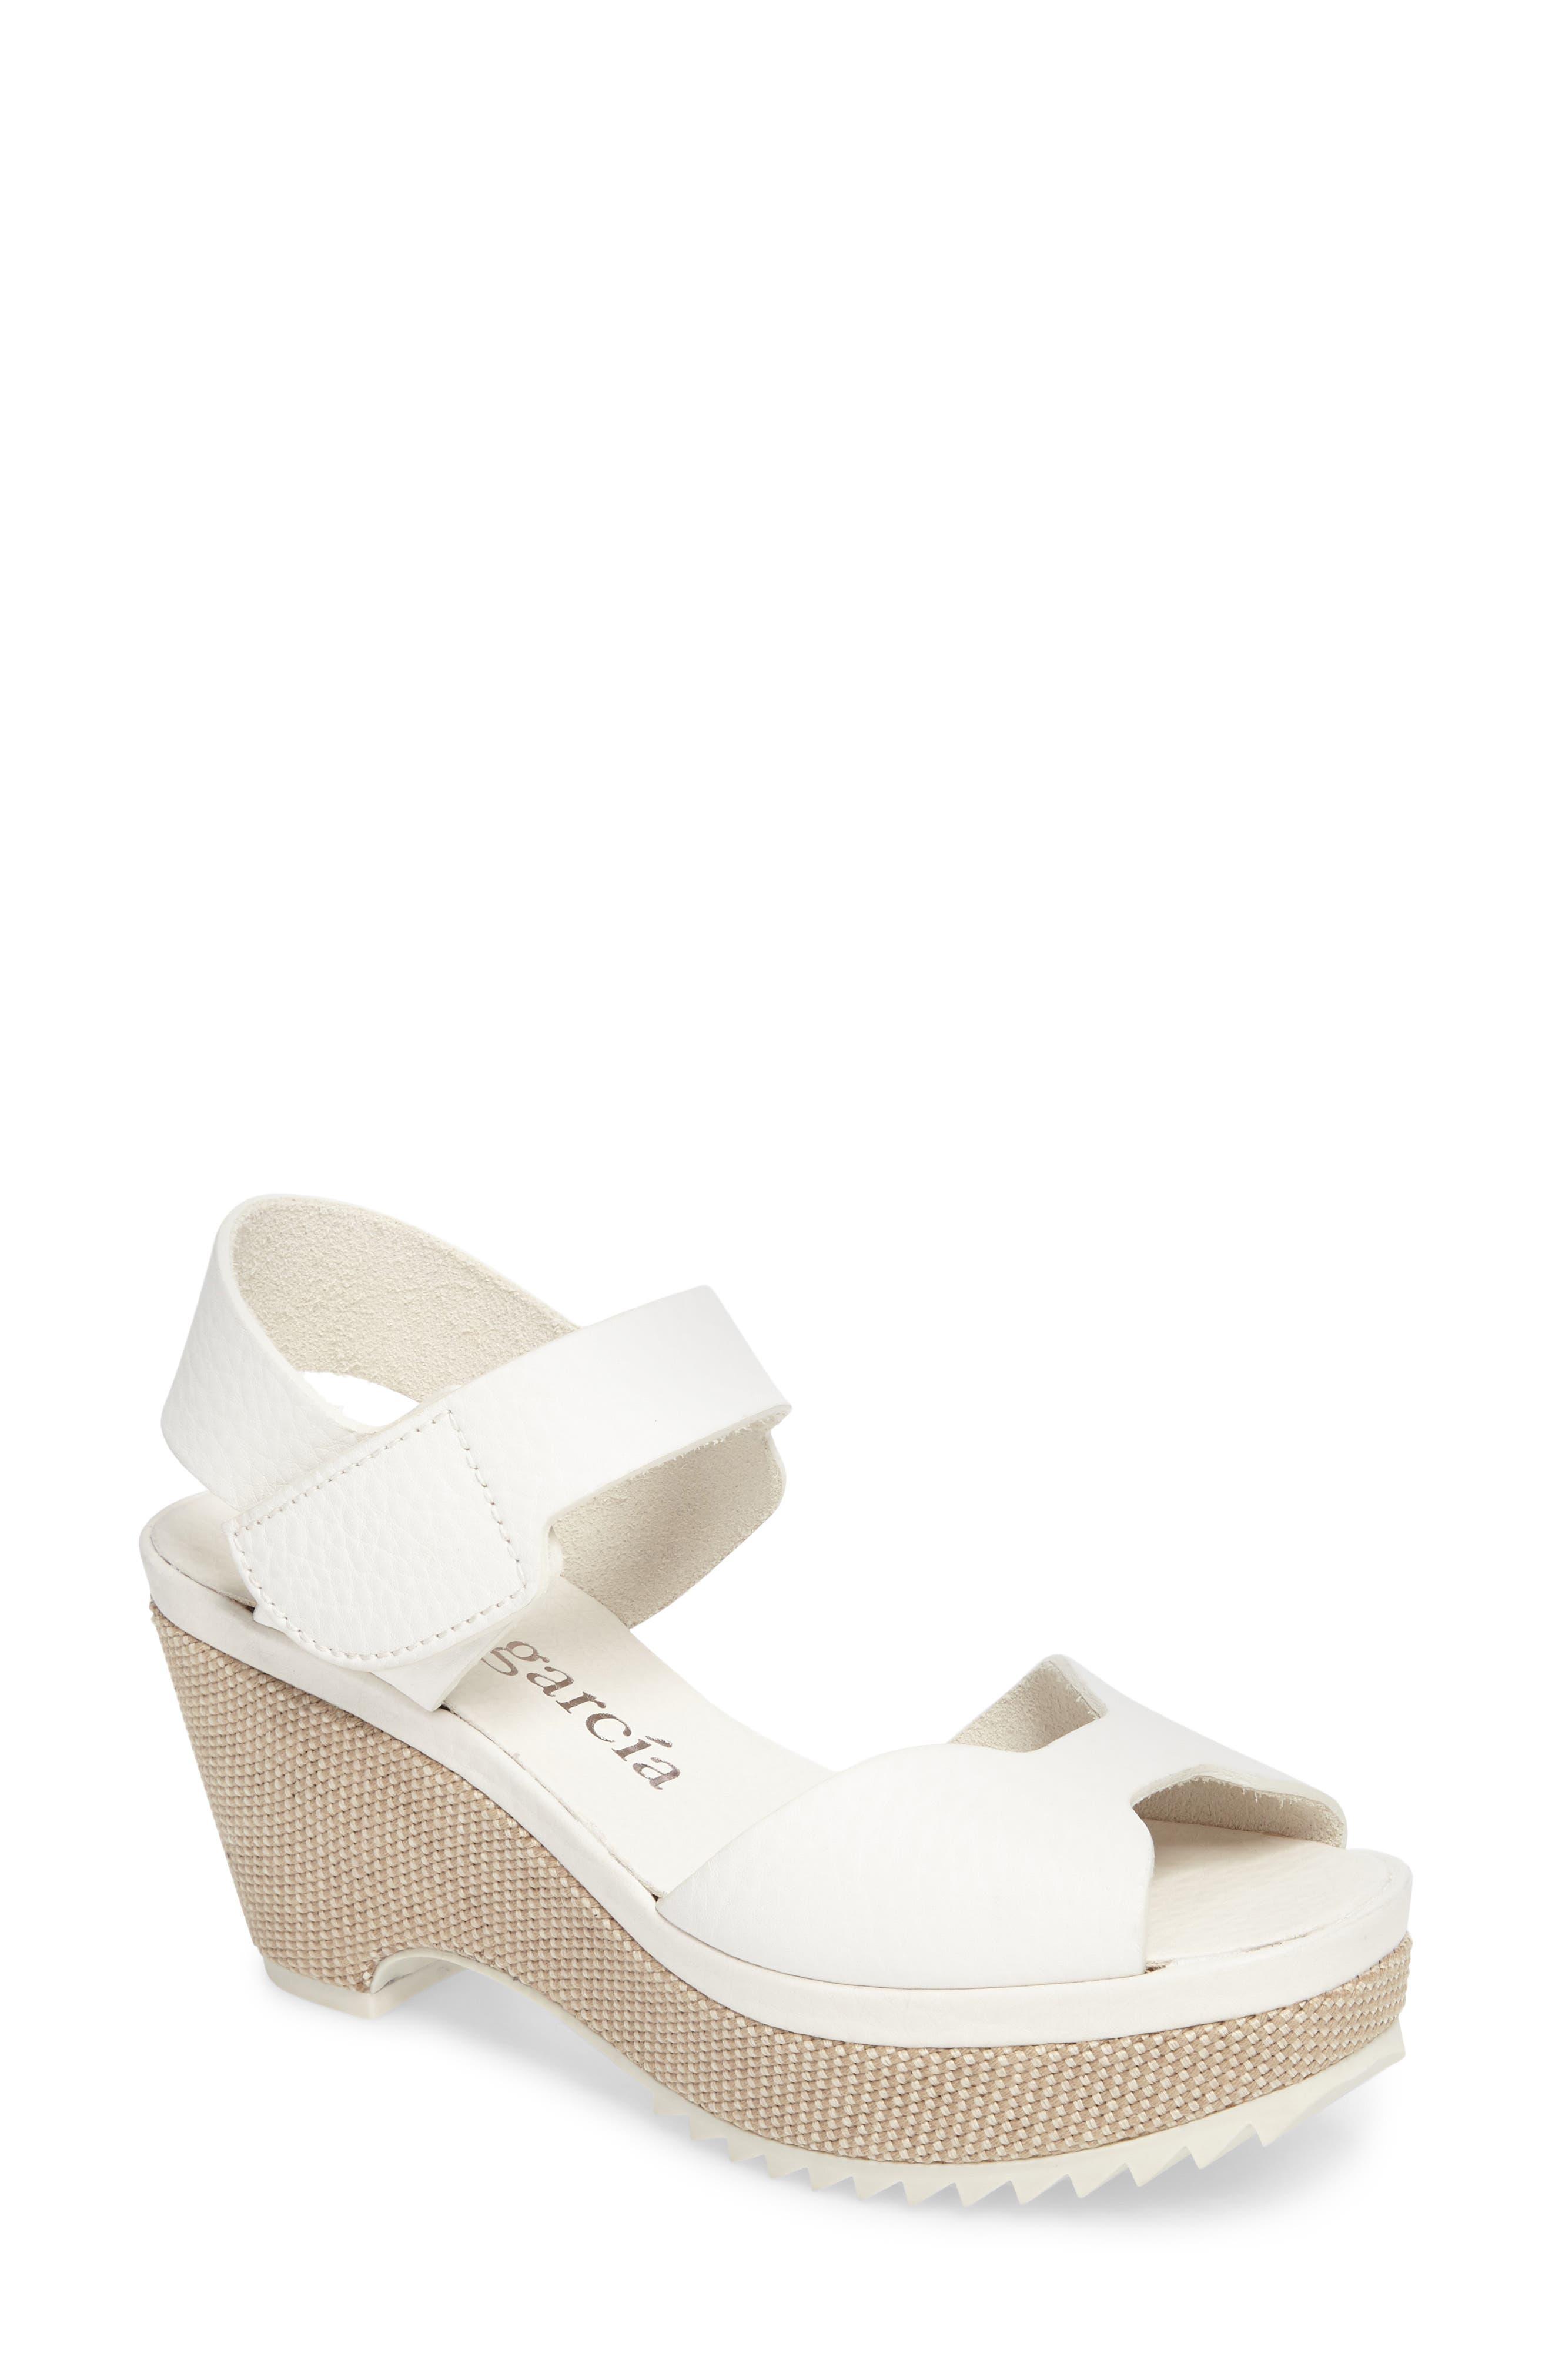 Fah Wedge Sandal,                         Main,                         color, White Cervo